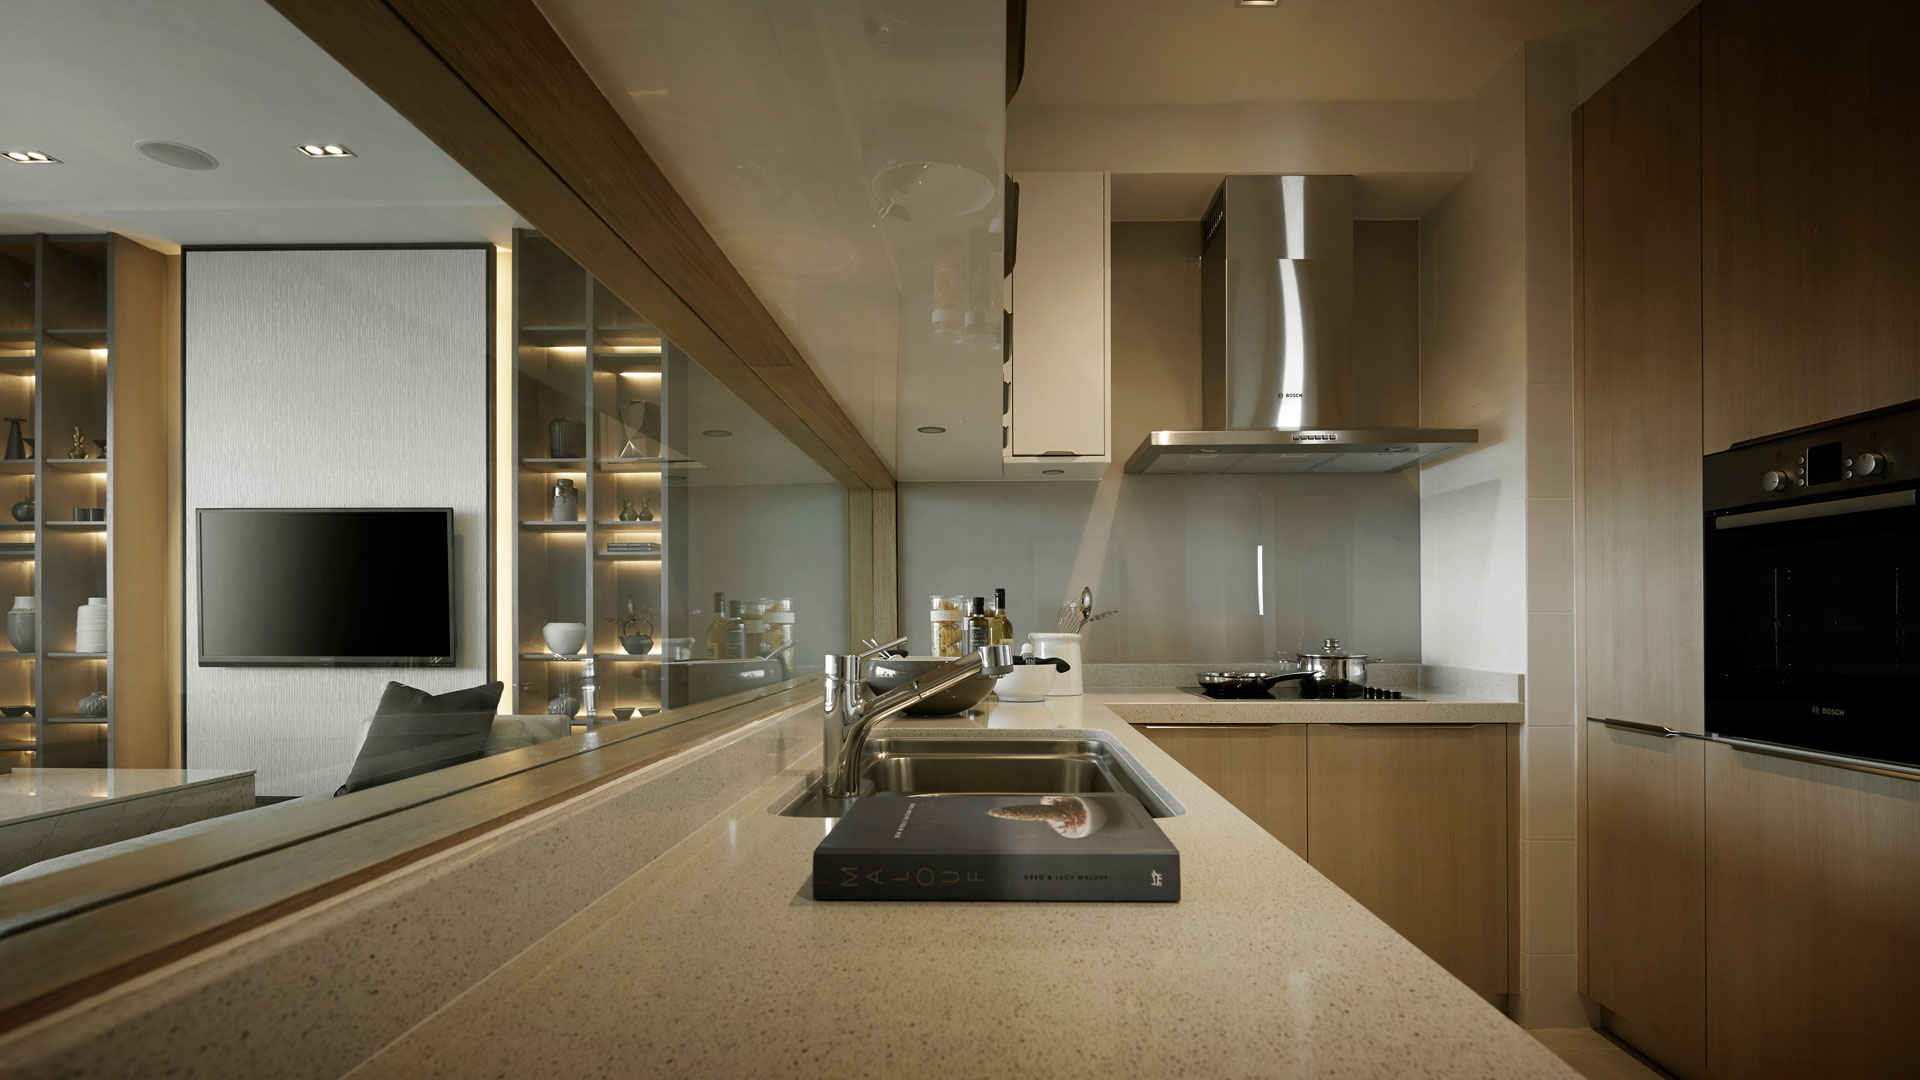 Southen Marina Kitchen Interior Design Nice Style